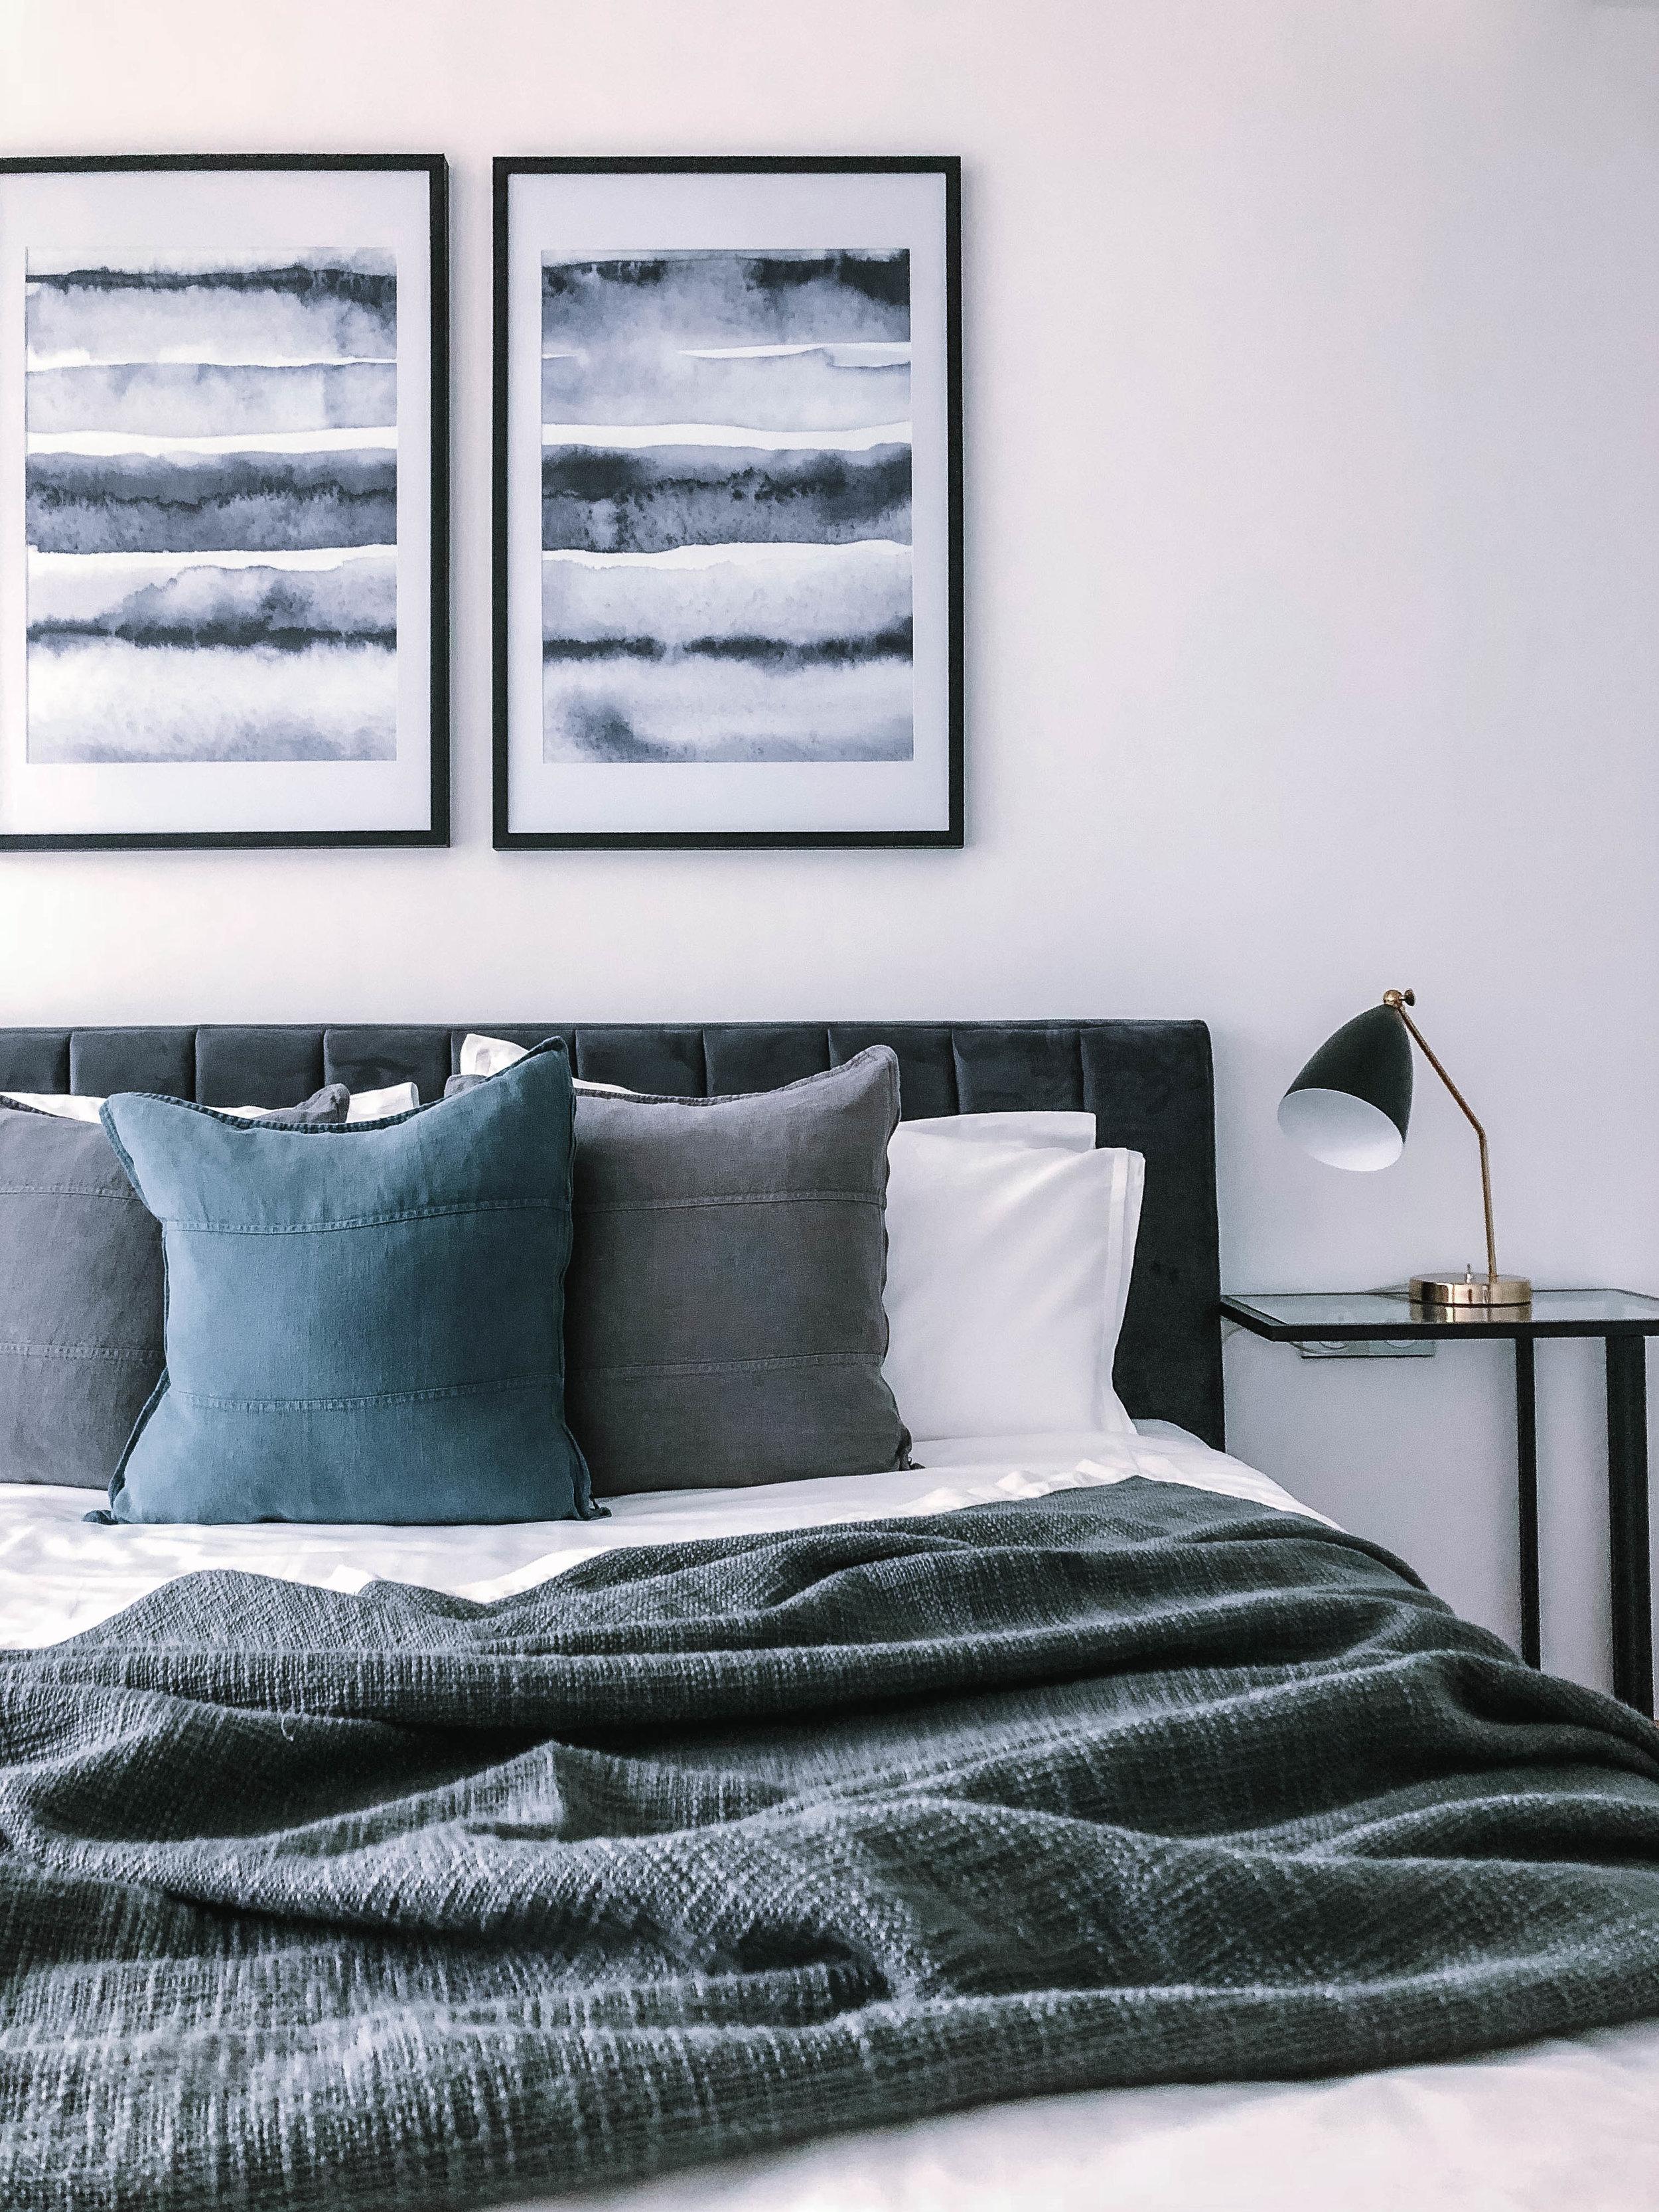 Turn Key Project Bedroom Decor